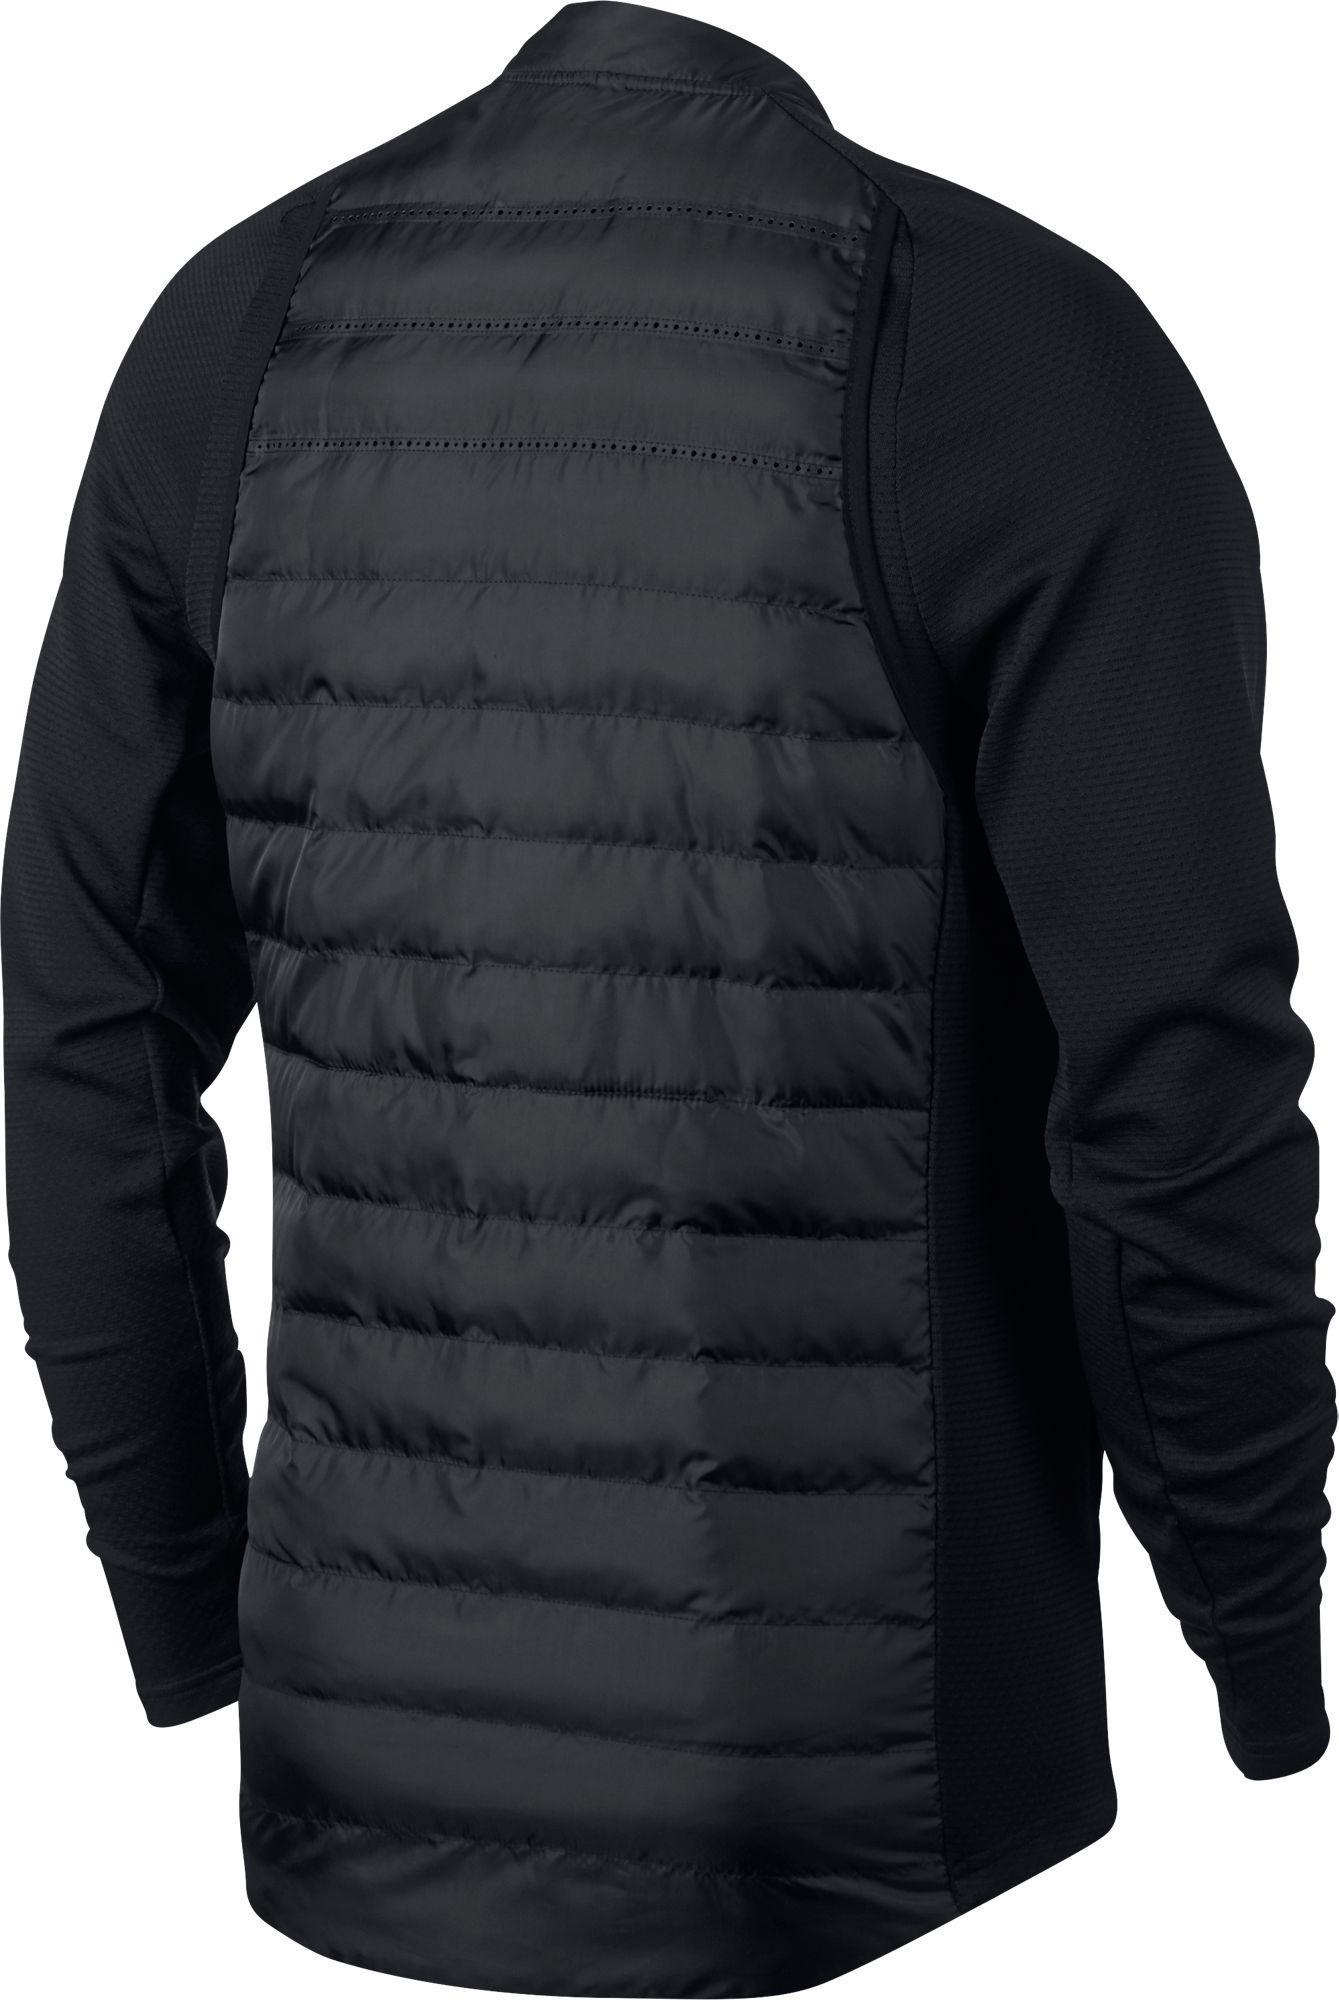 online retailer 3b5c7 f56d2 Nike Aeroloft Hyperadapt Golf Jacket in Black for Men - Lyst